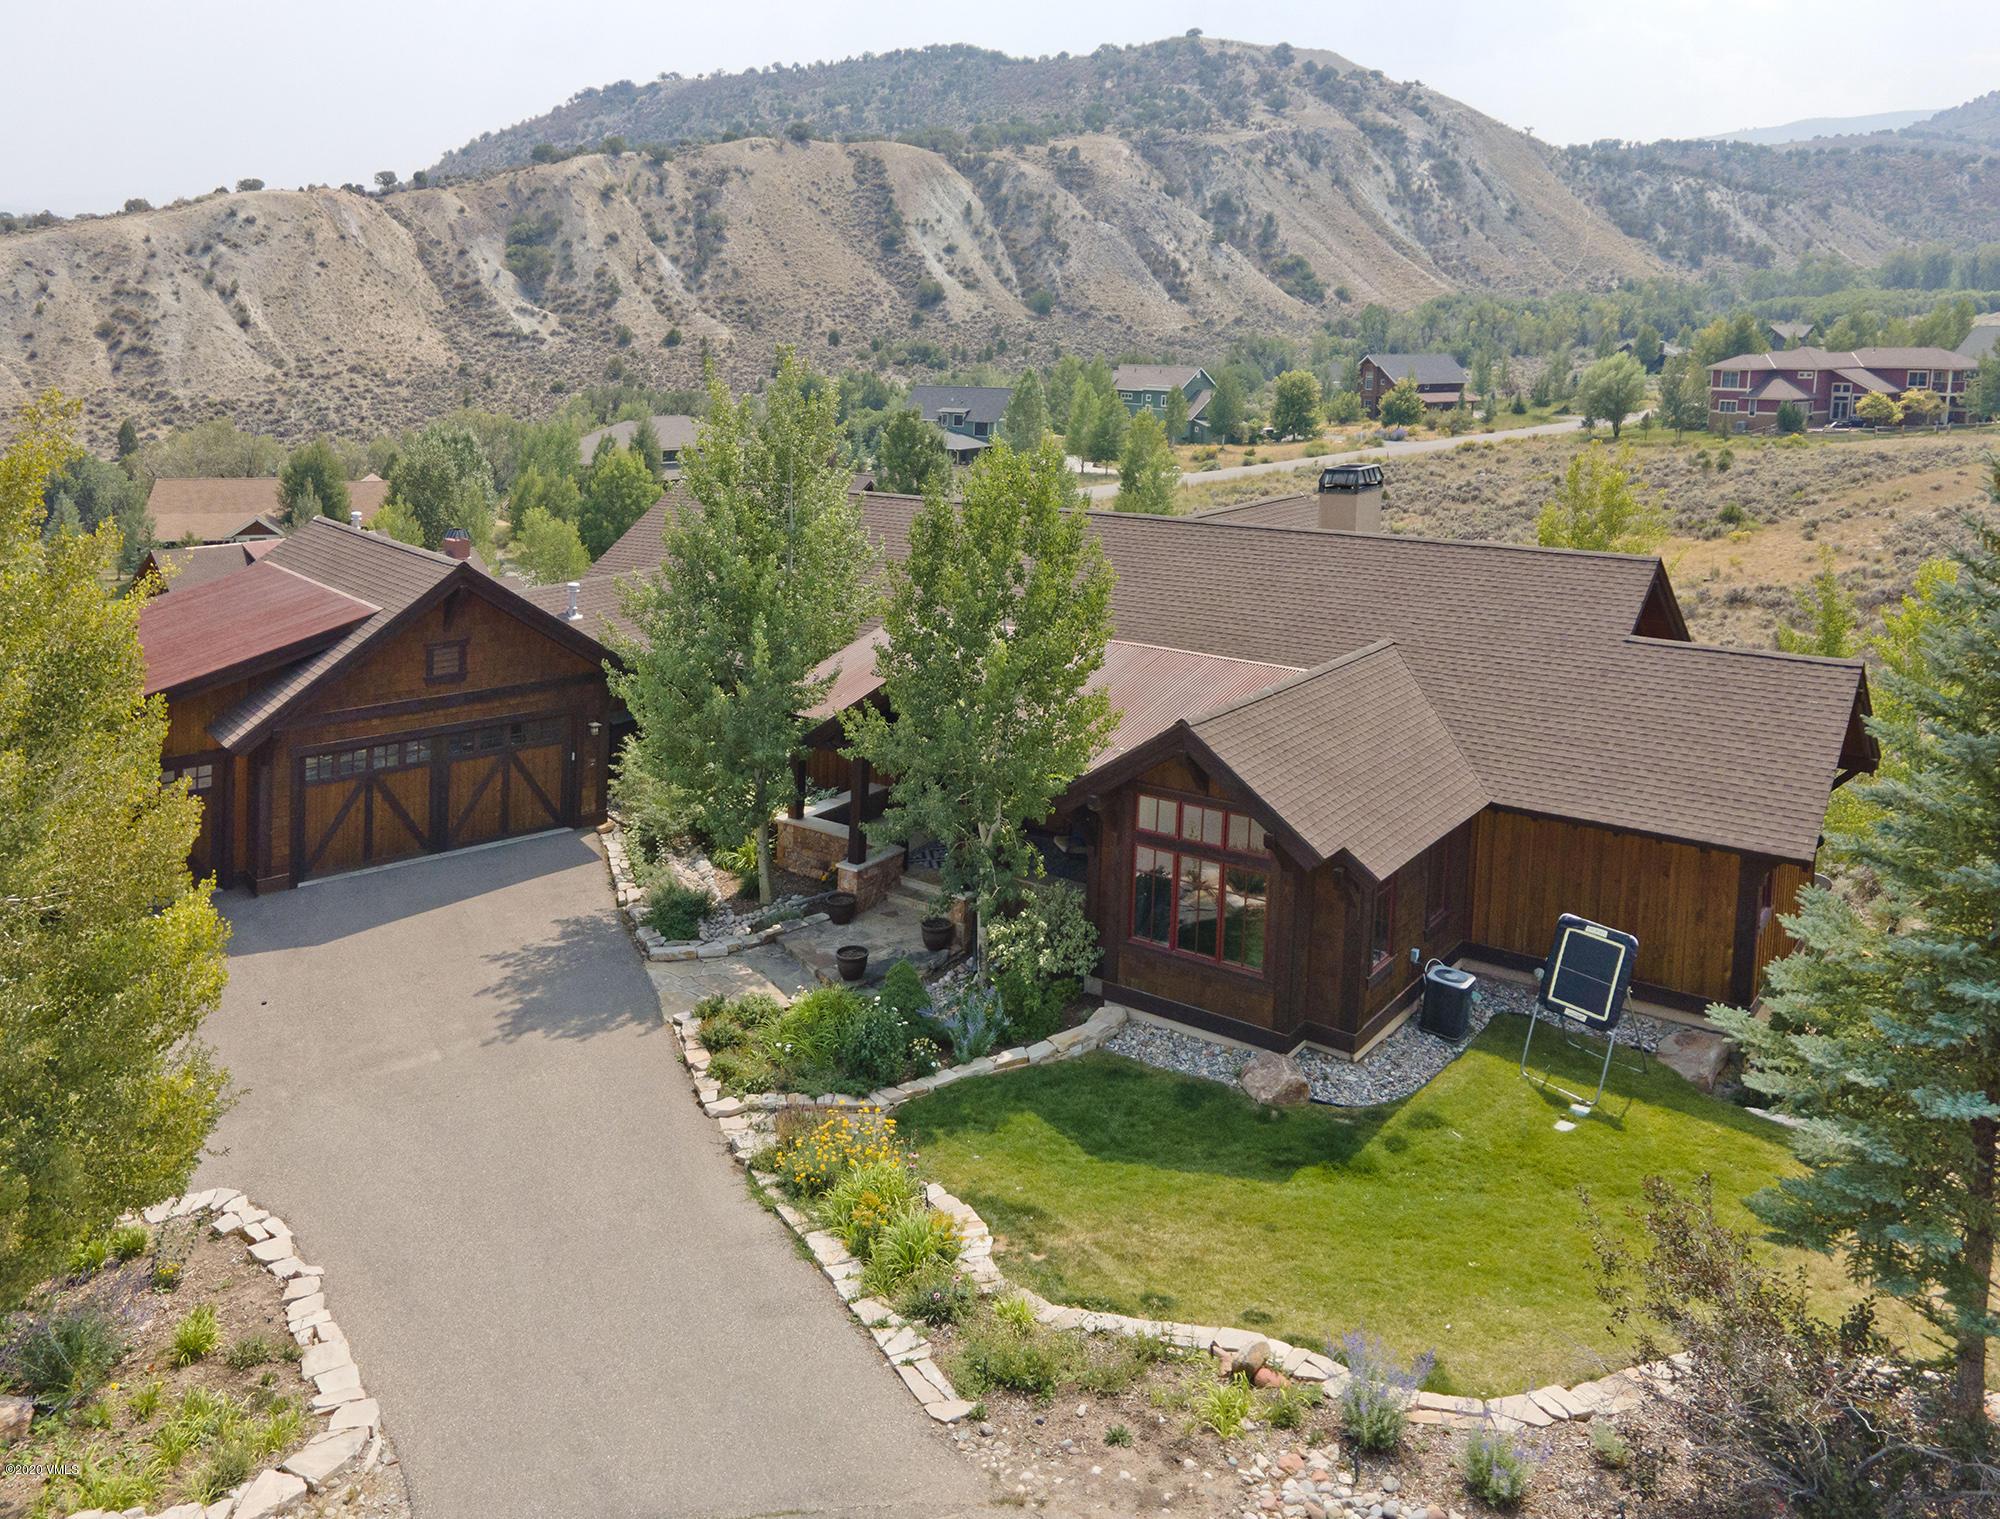 1171 Hernage Creek Road, Eagle, Co 81631 Property Photo